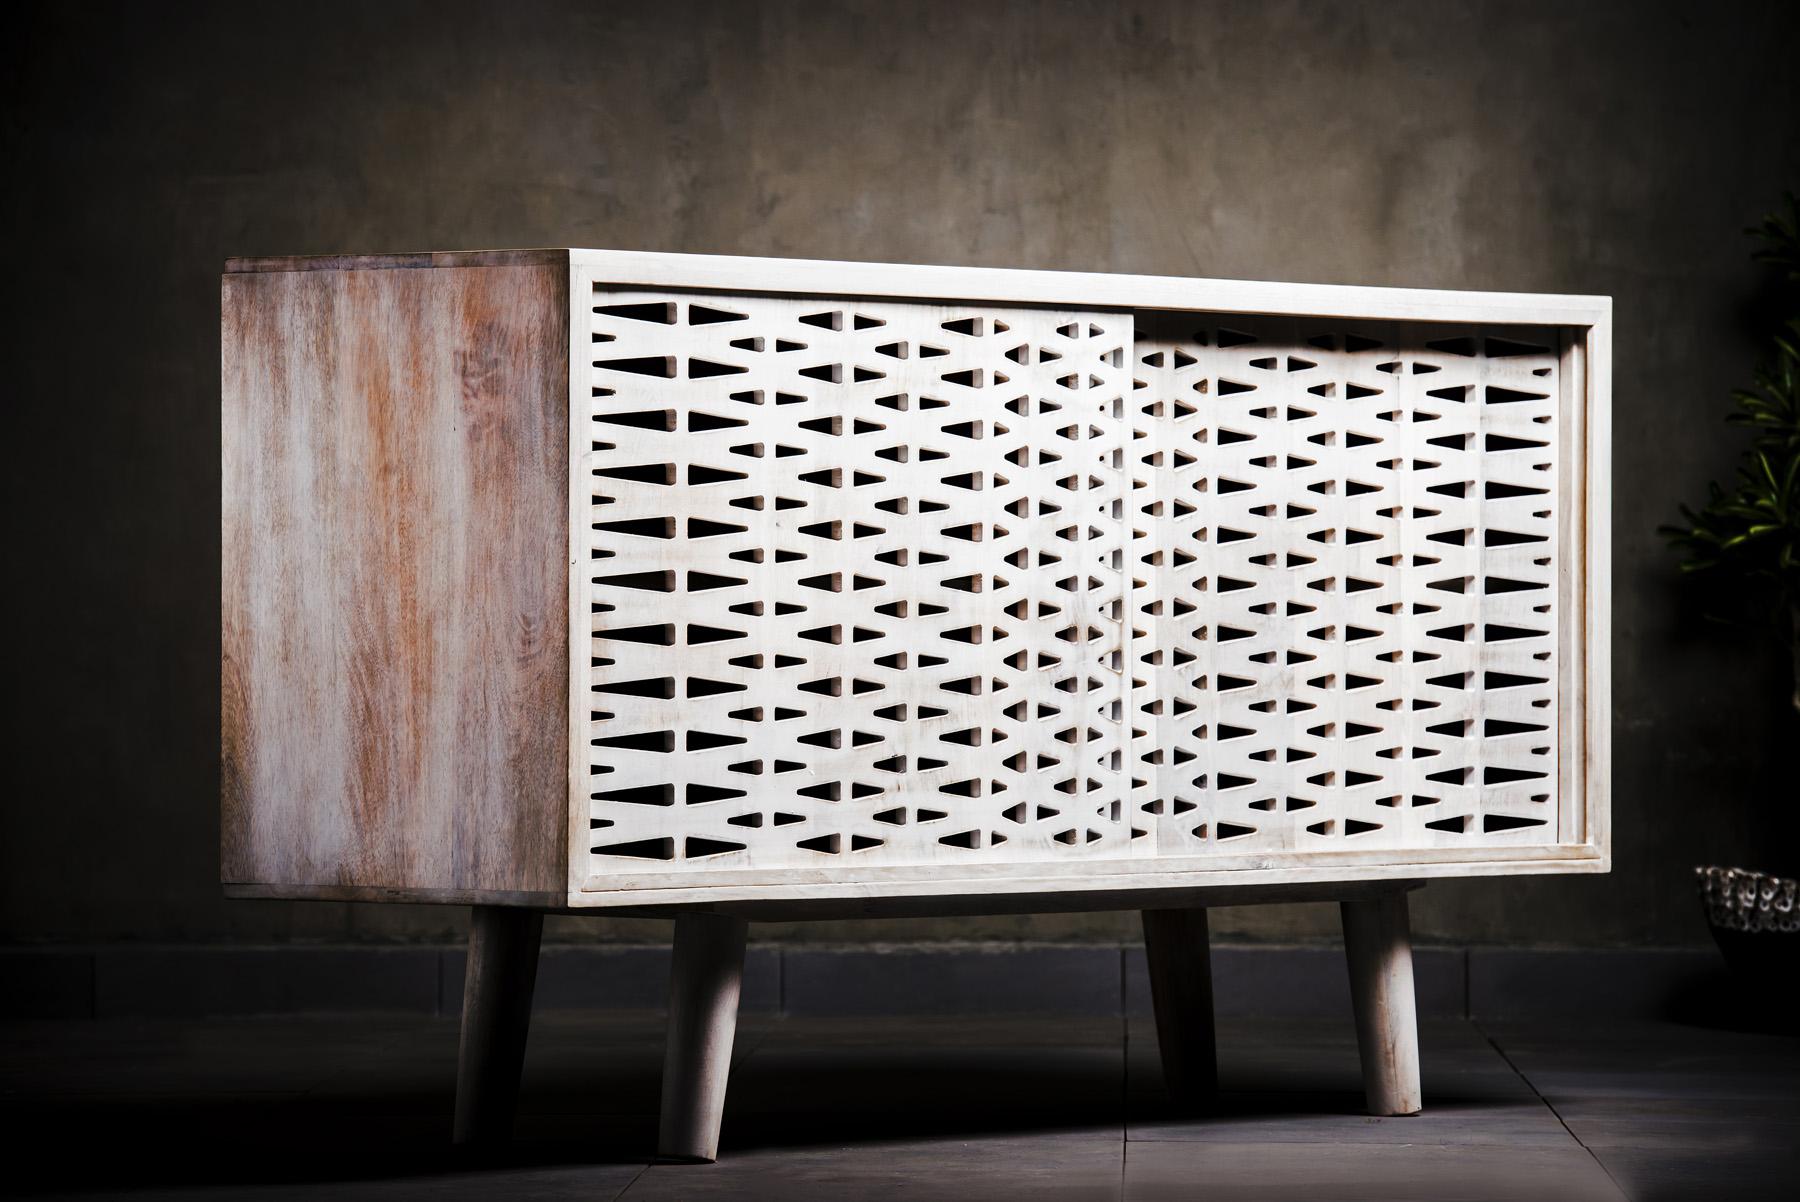 inliving IHDP furniture photography aditya mendiratta 6